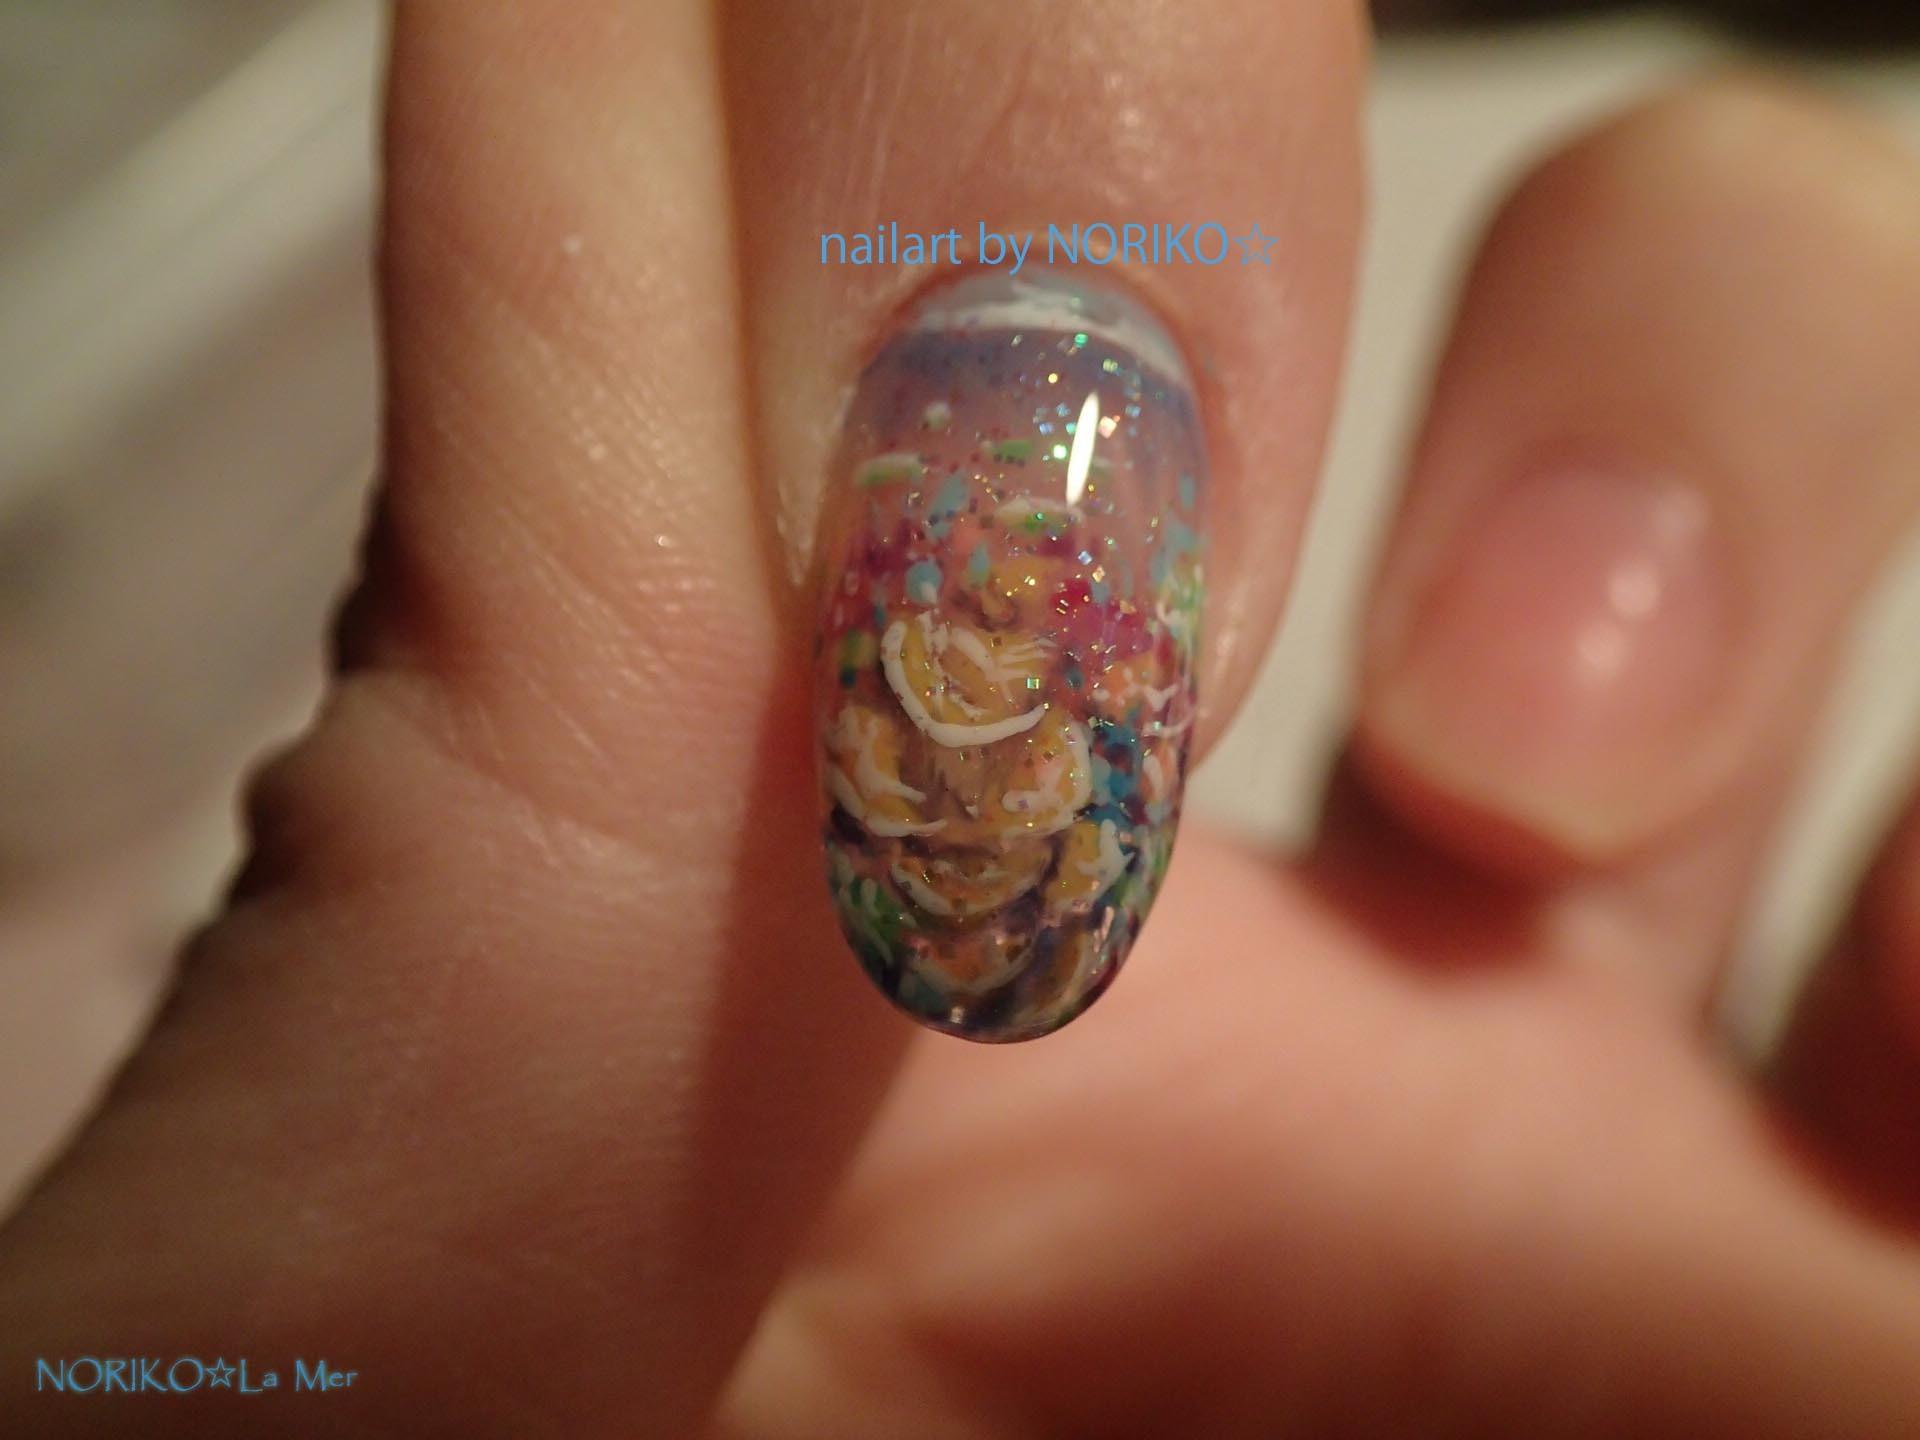 Nail Artist NORIKO palau gelpaint _8